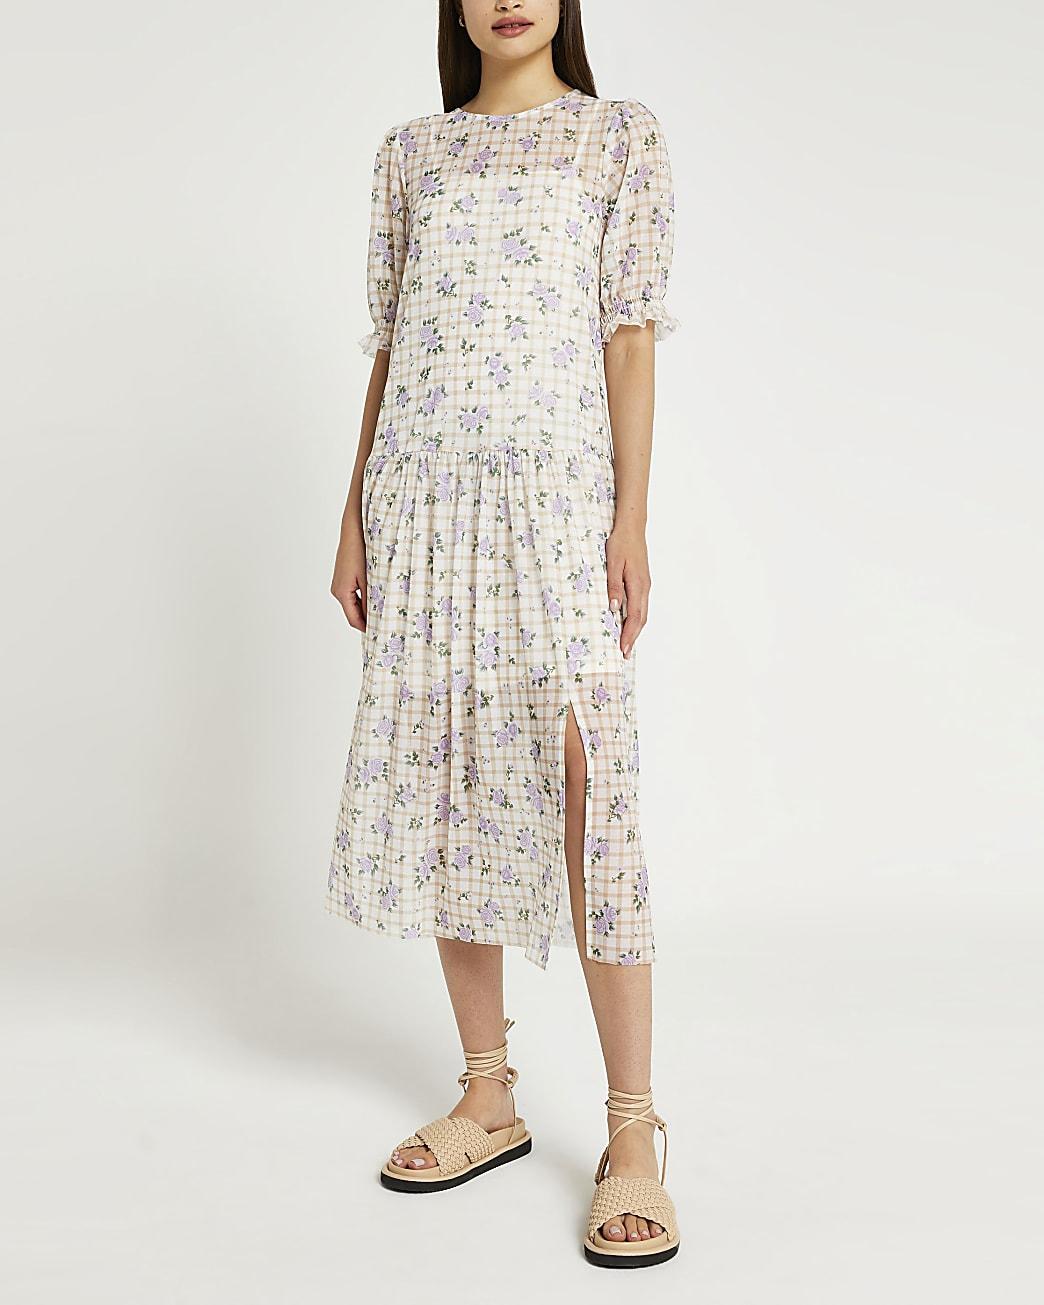 Beige floral check midi dress